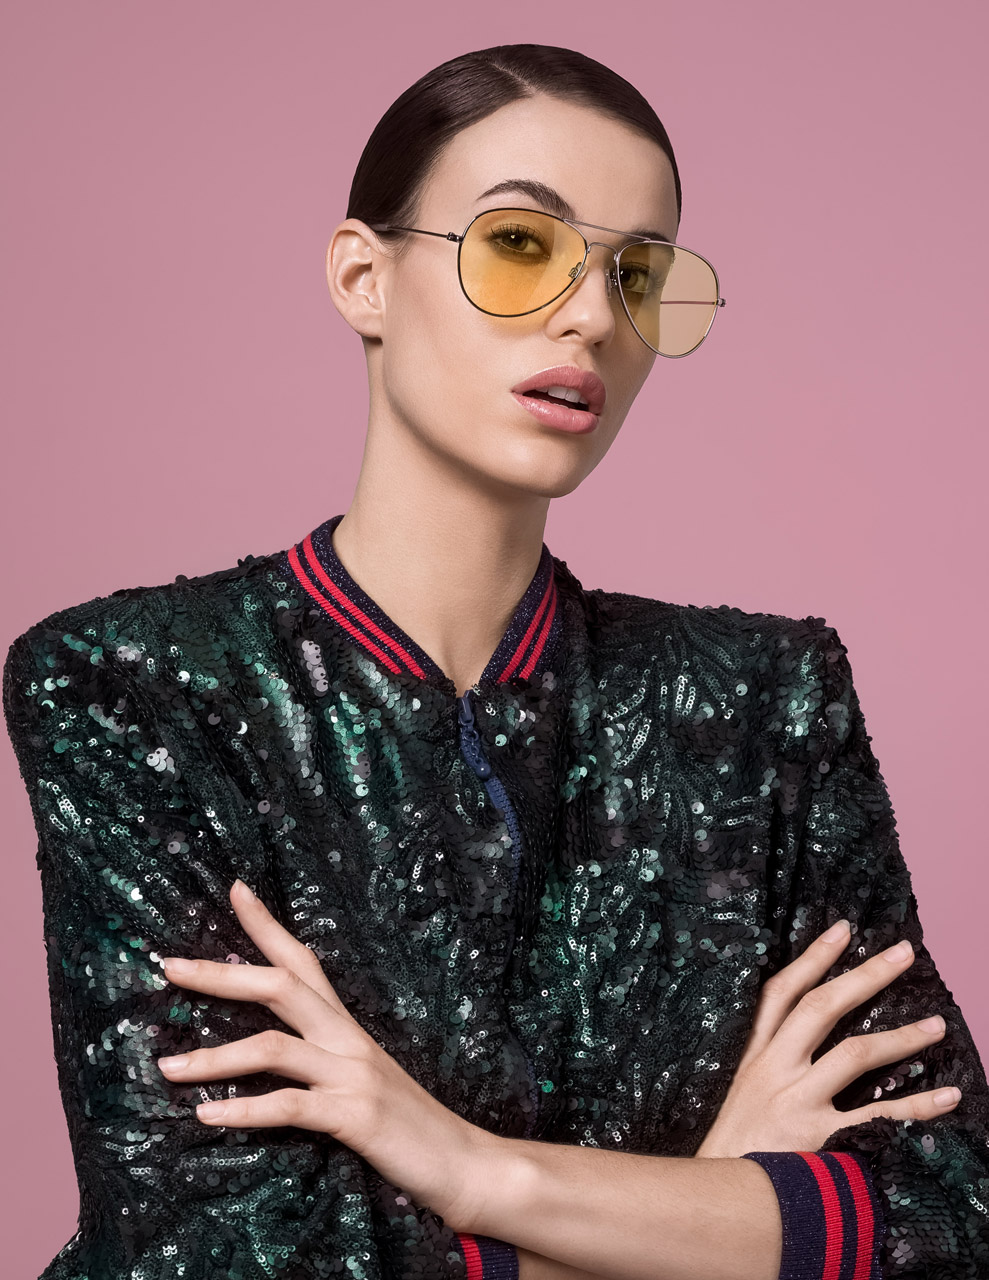 Nadia-Duca-Makeup-Artist-commercial (24).jpg